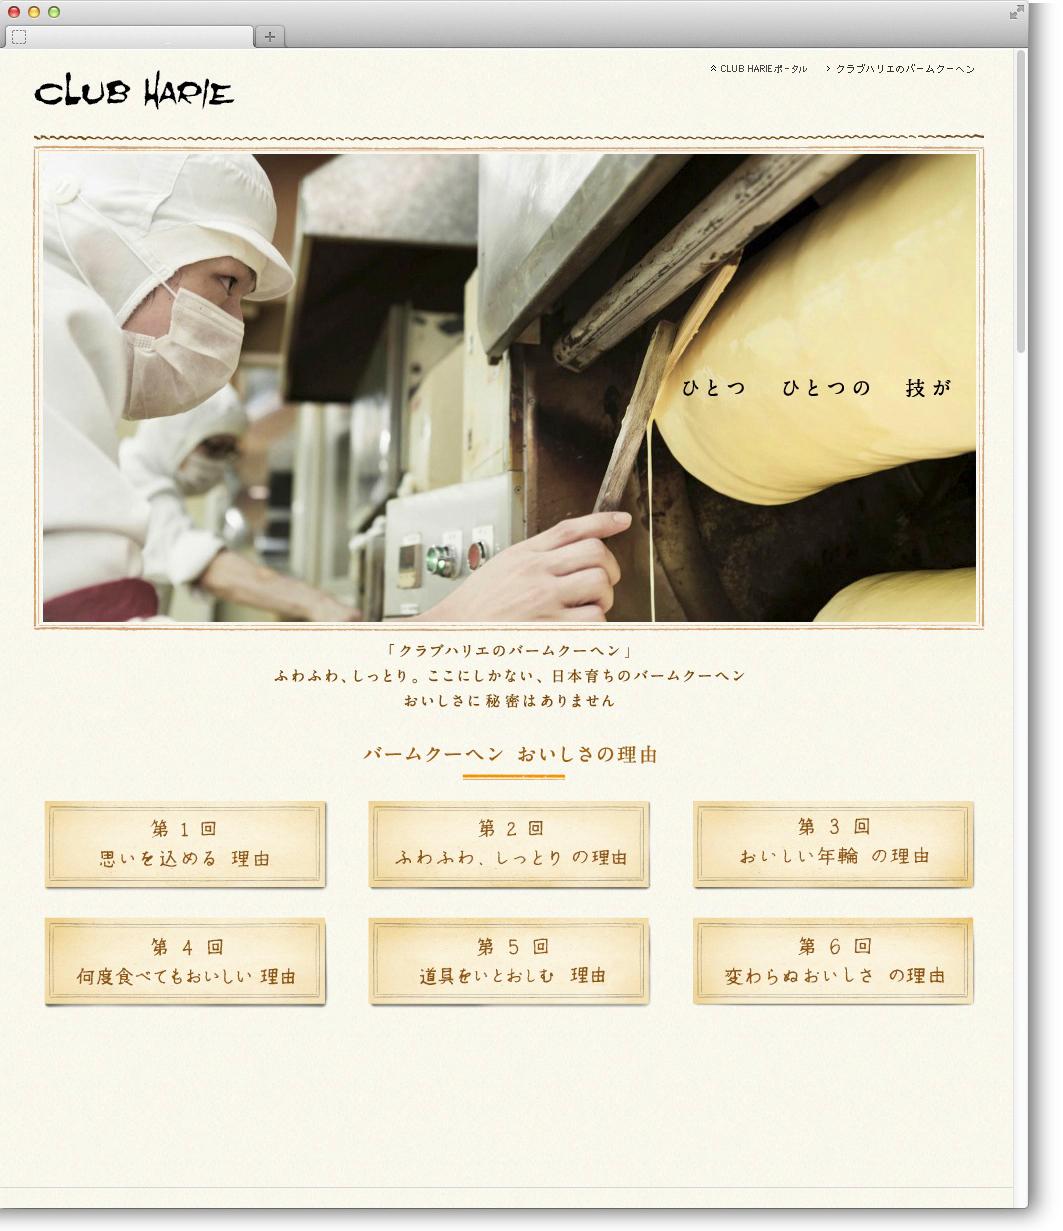 CLUB HARIE〈web site〉